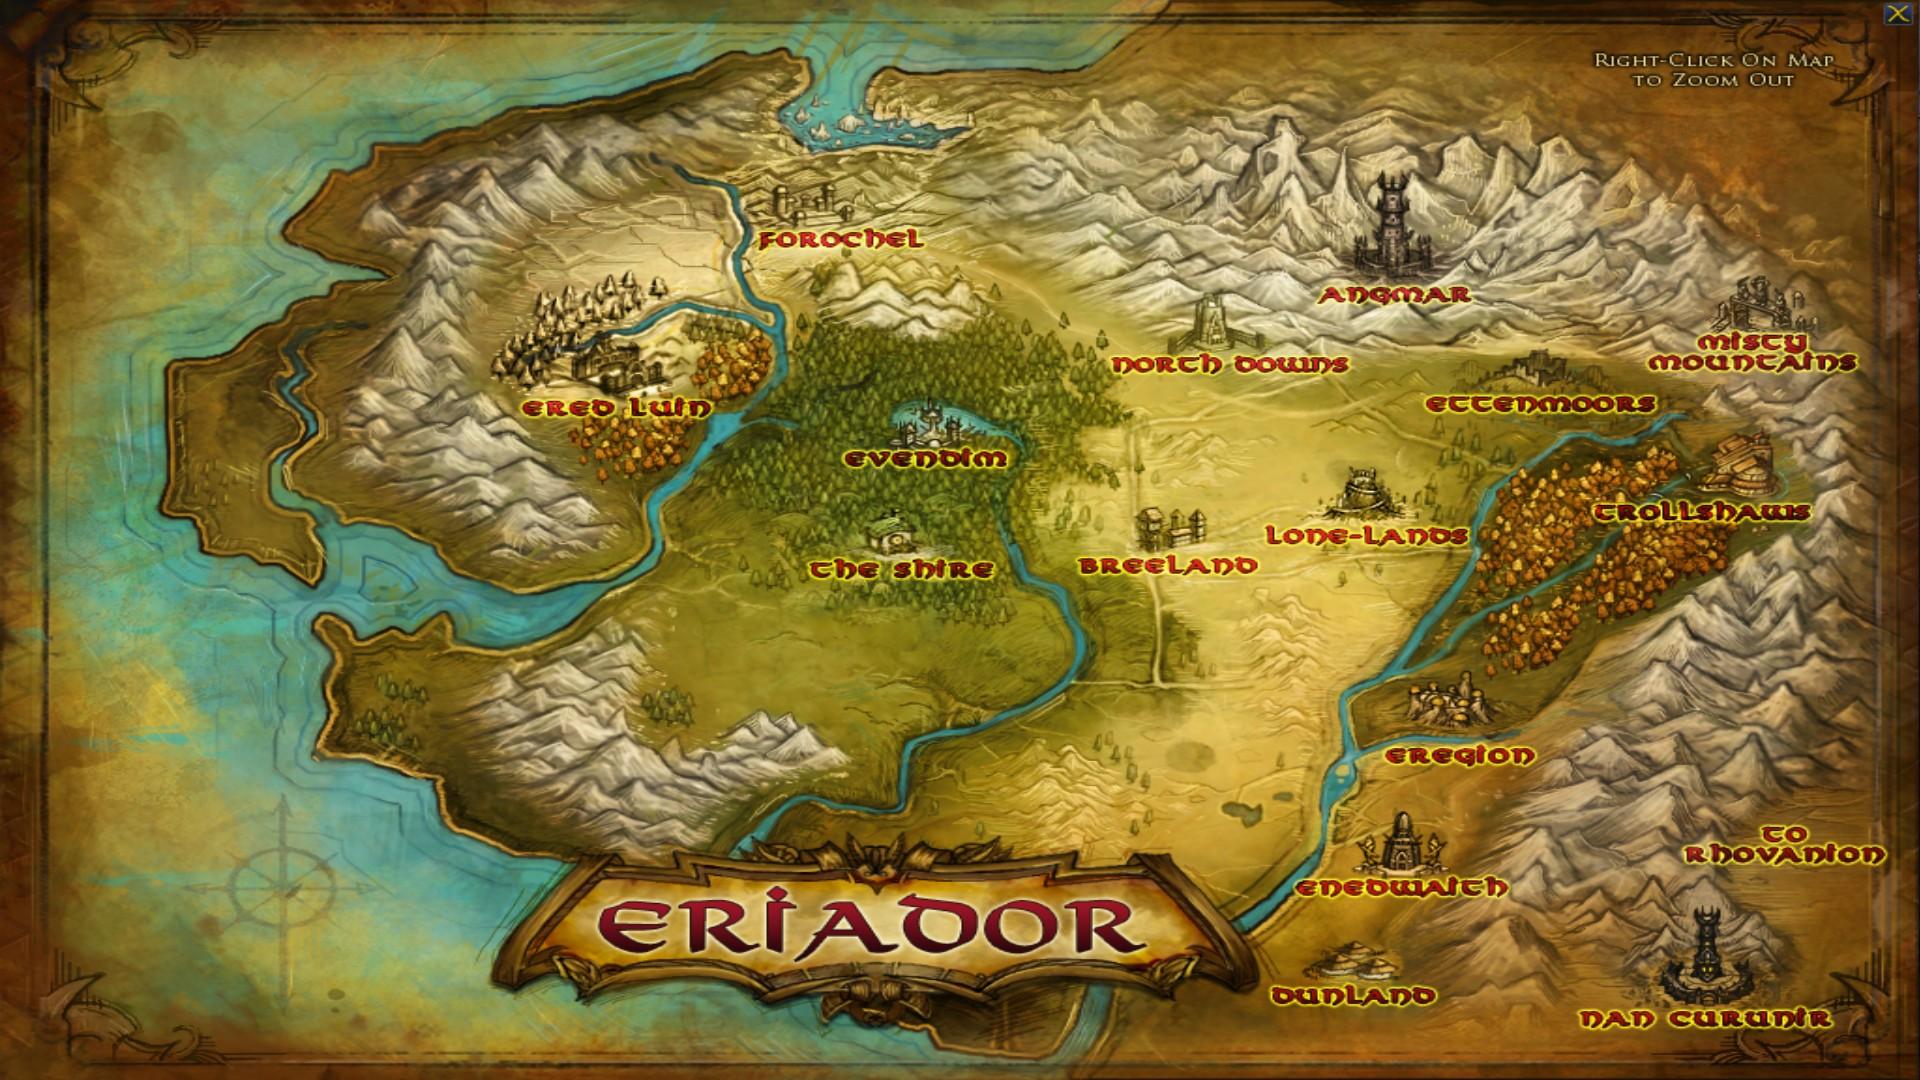 Open-world Eriador map v1 3 addon - Edain Community Content